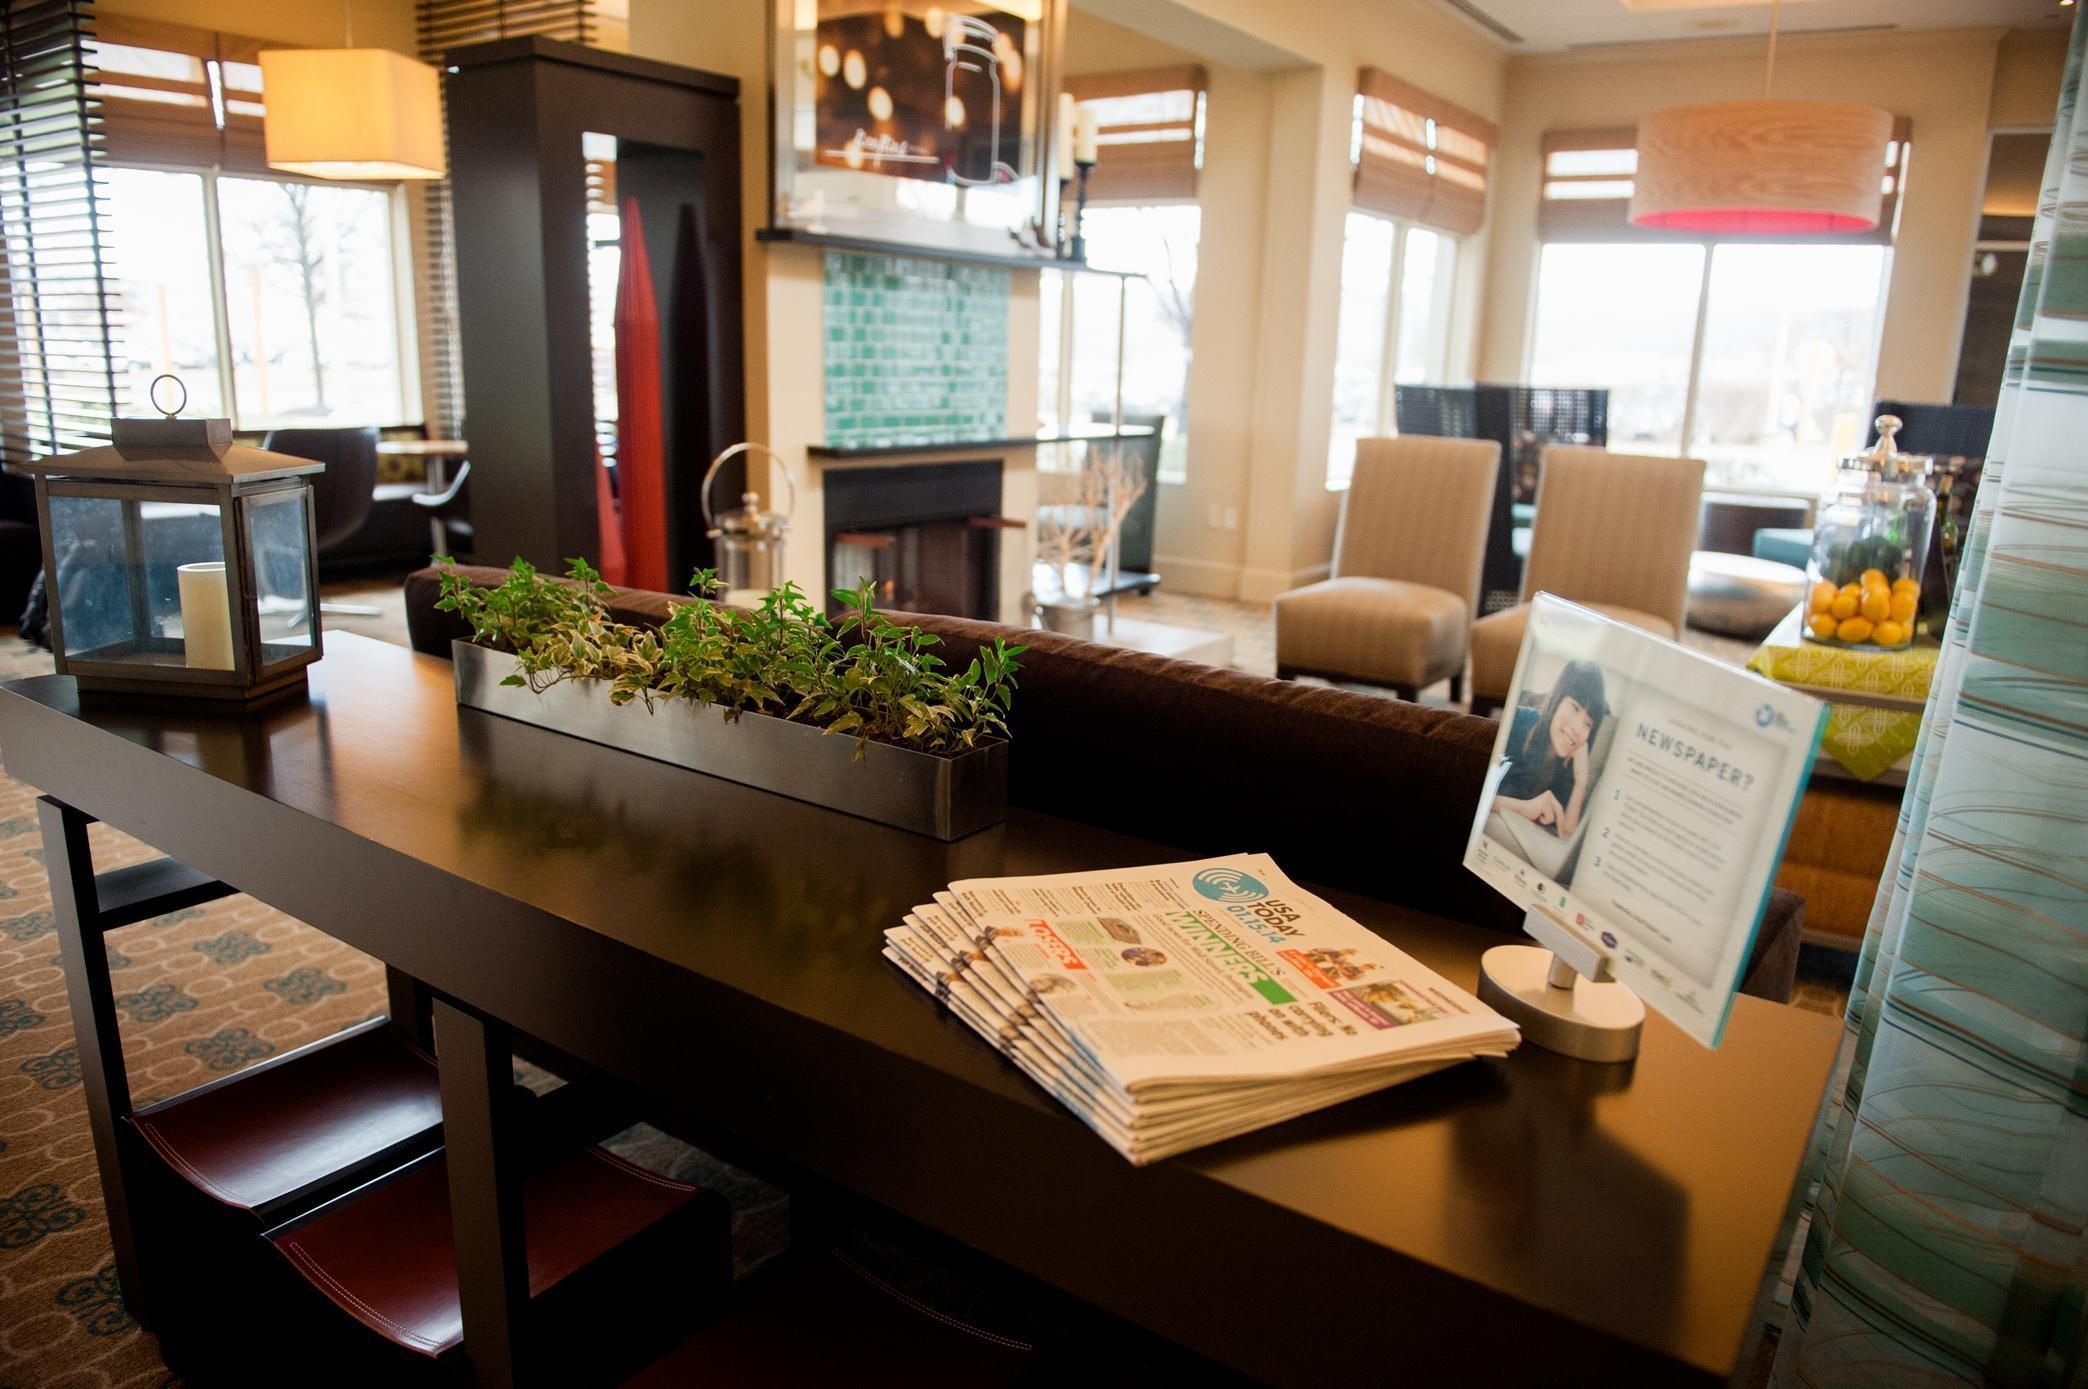 Hilton Garden Inn Rockaway image 0